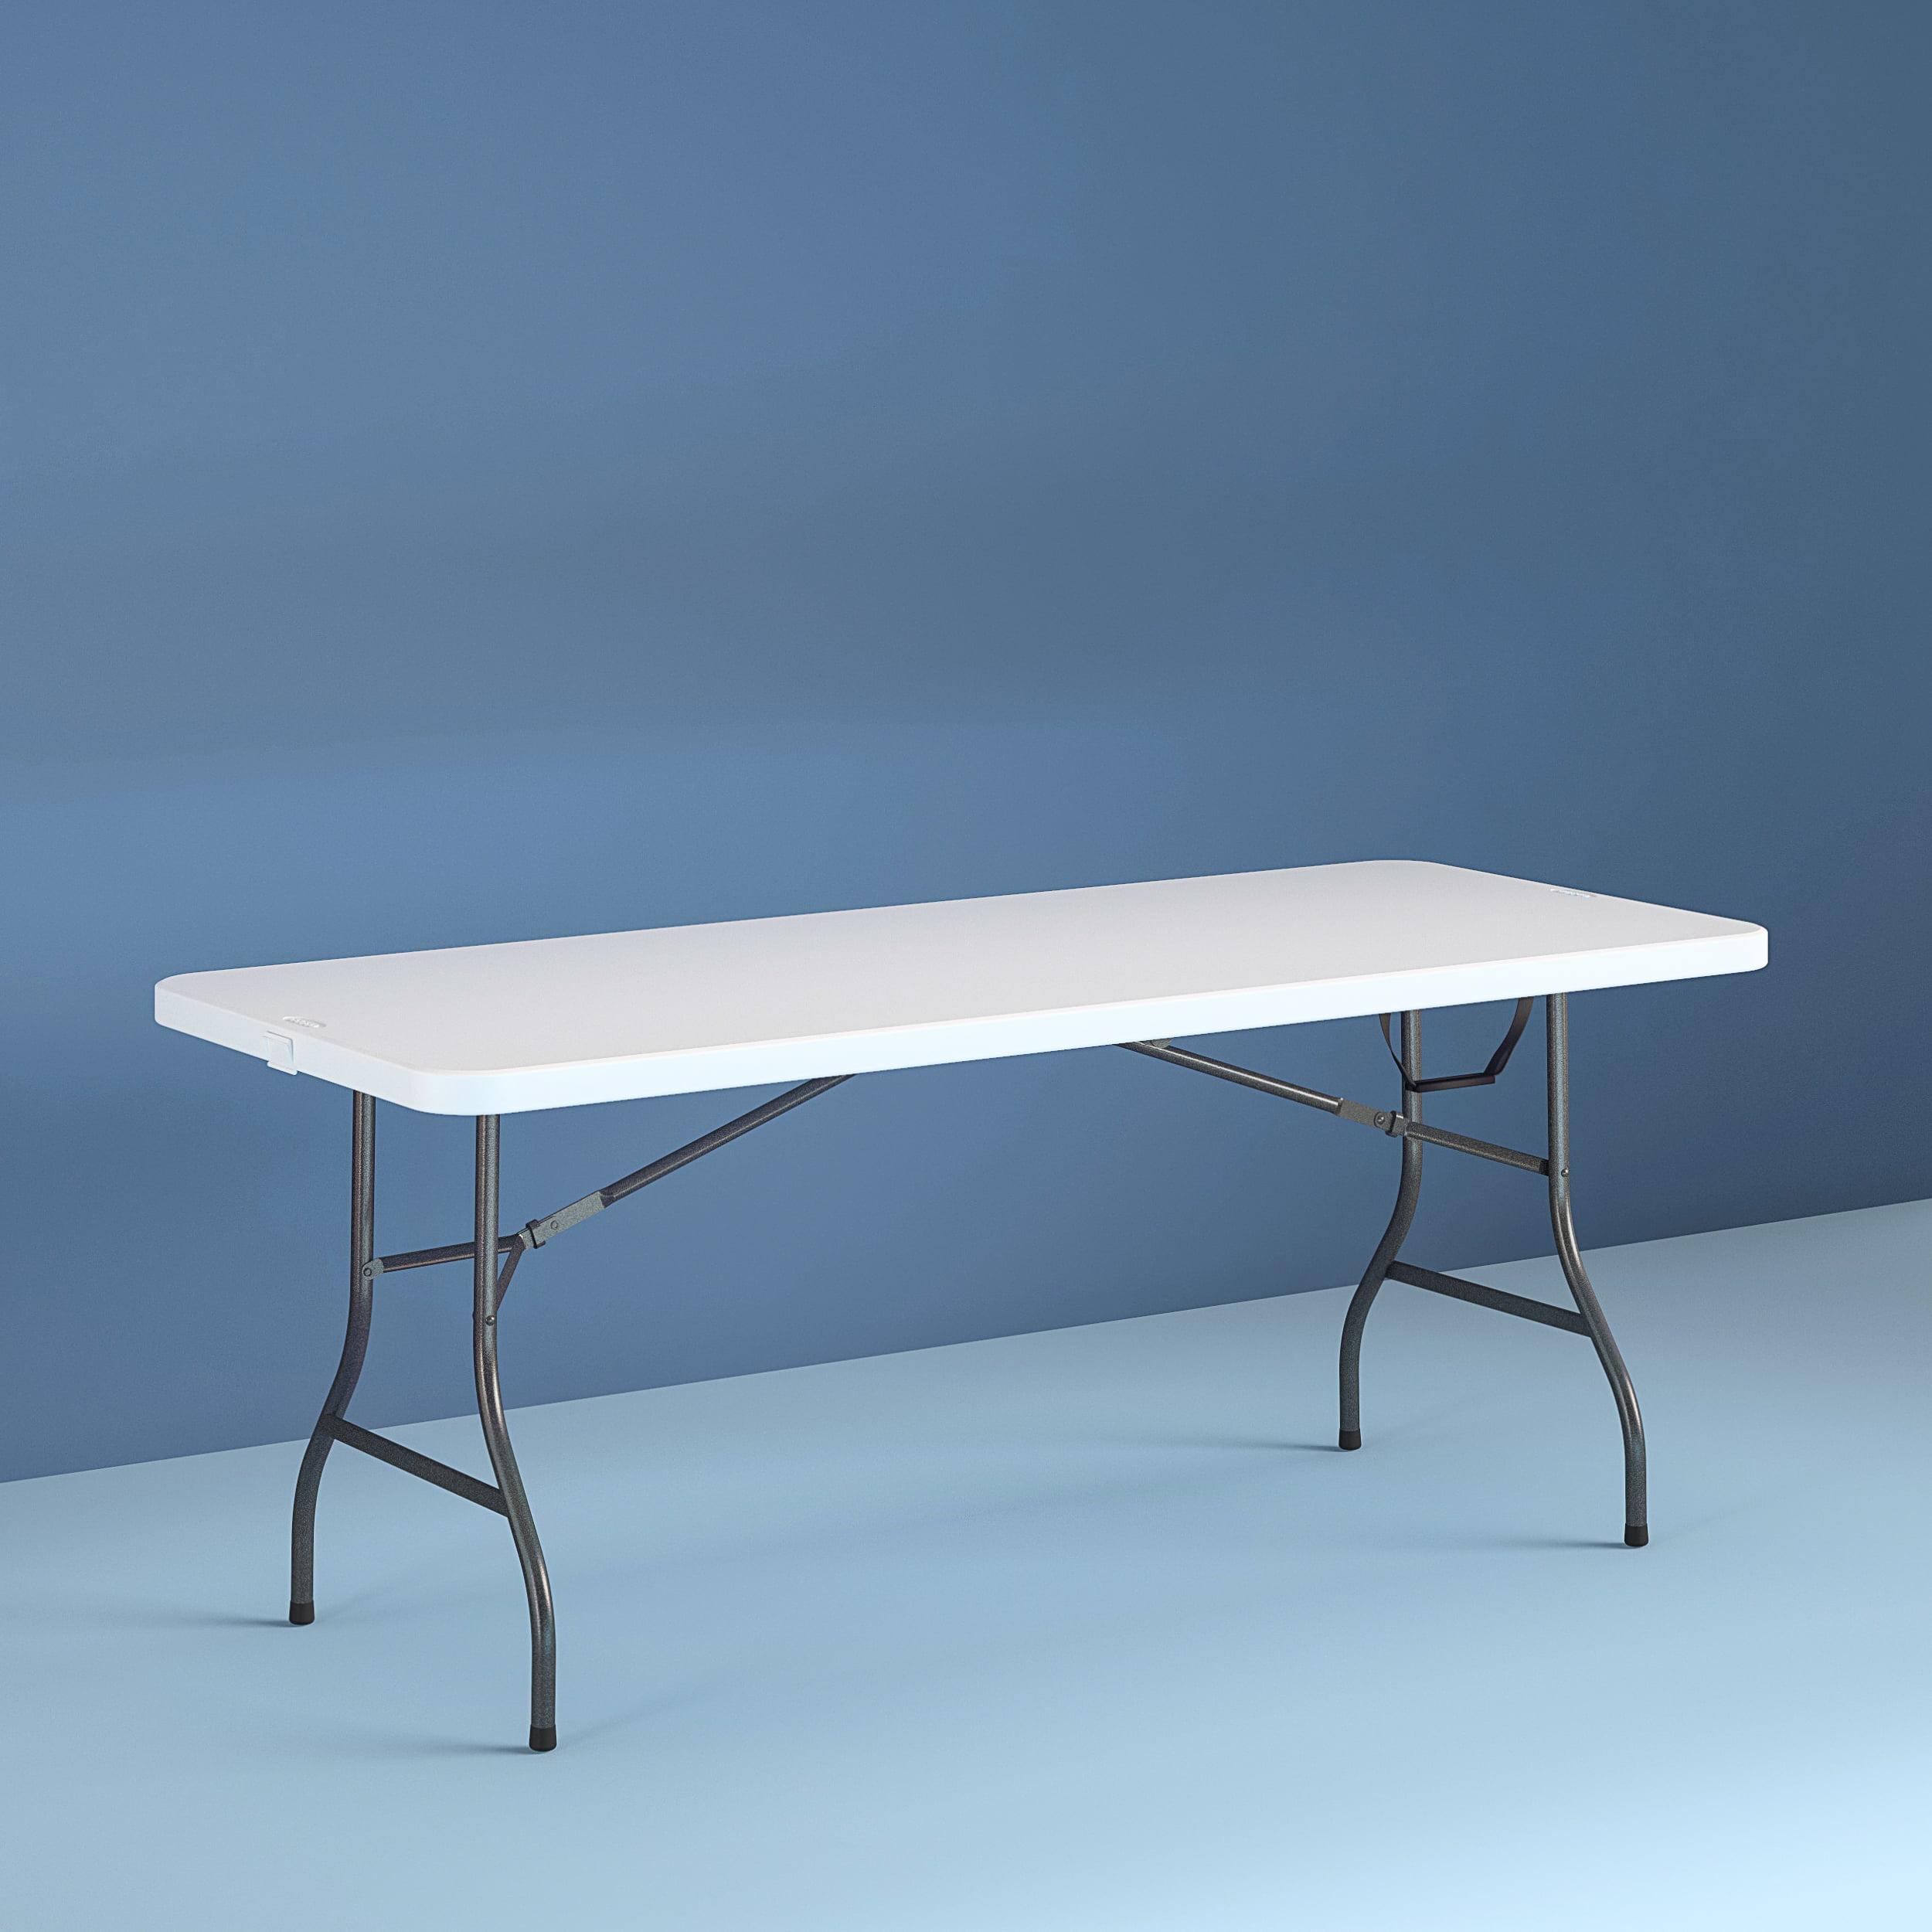 - Cosco 8 Foot Centerfold Folding Table, White - Walmart.com